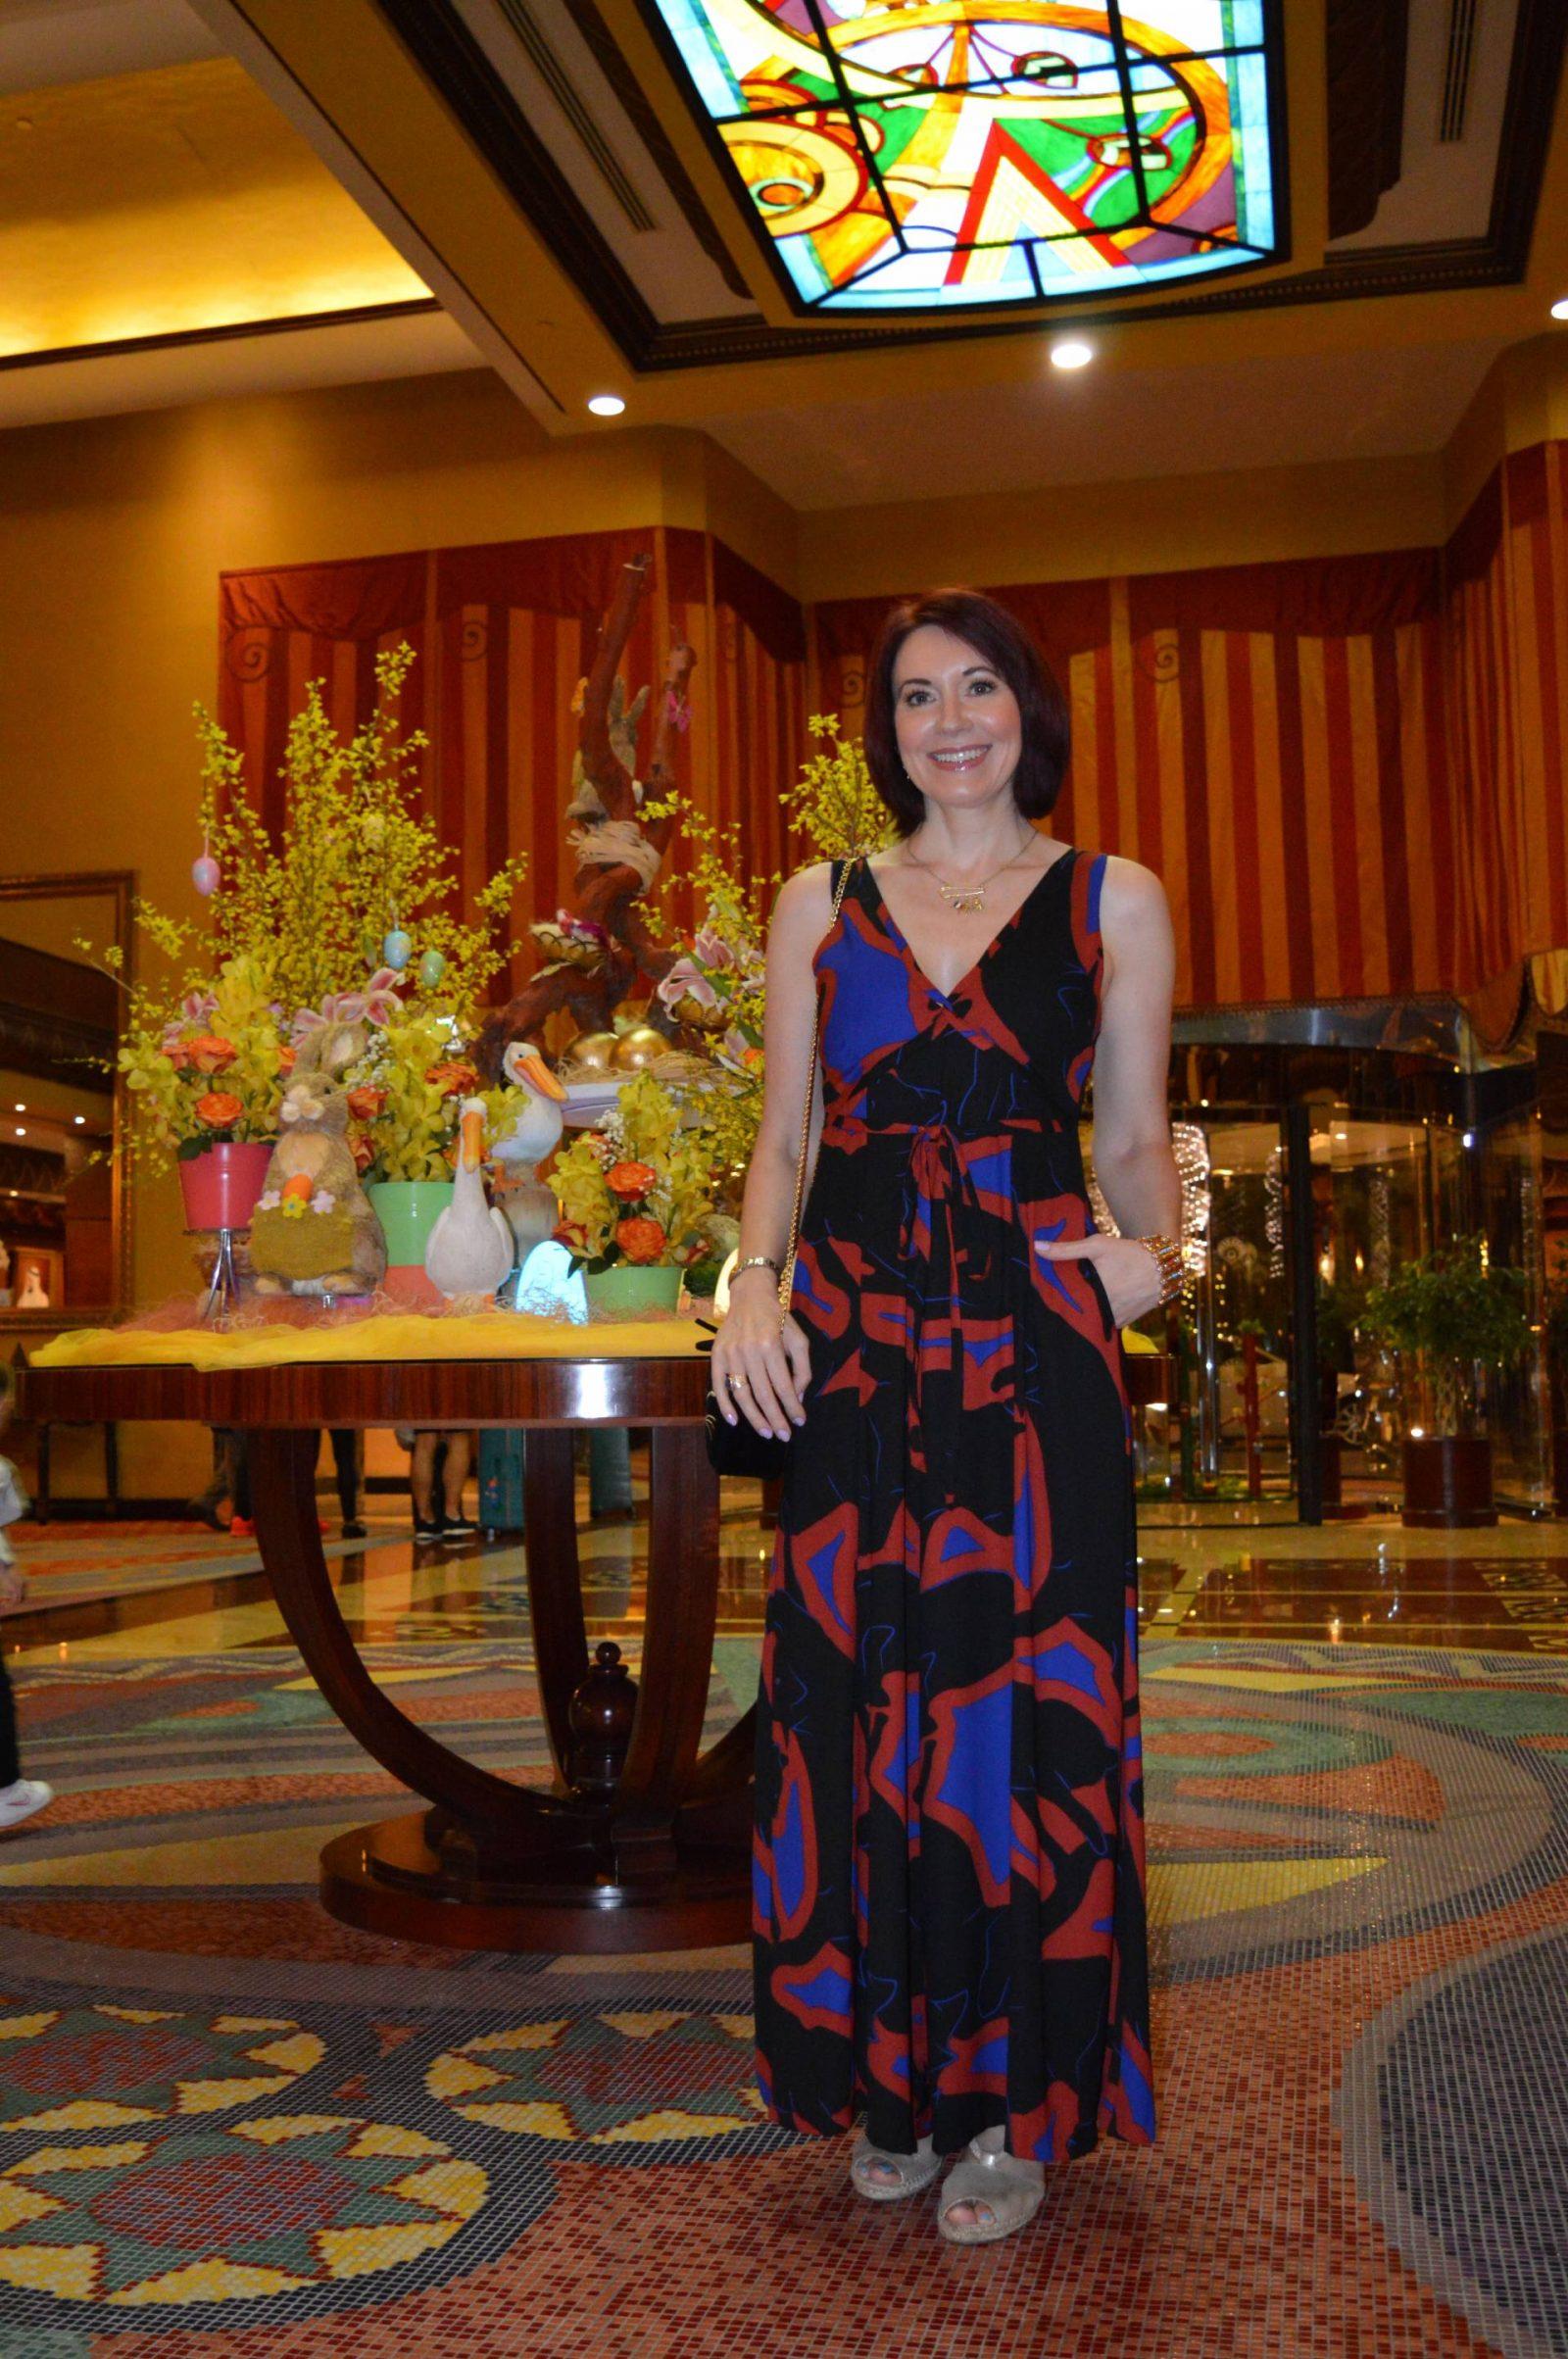 Issa Wide Leg Jumpsuit, lobby of Al Raha Beach hotel, Abu Dhabi